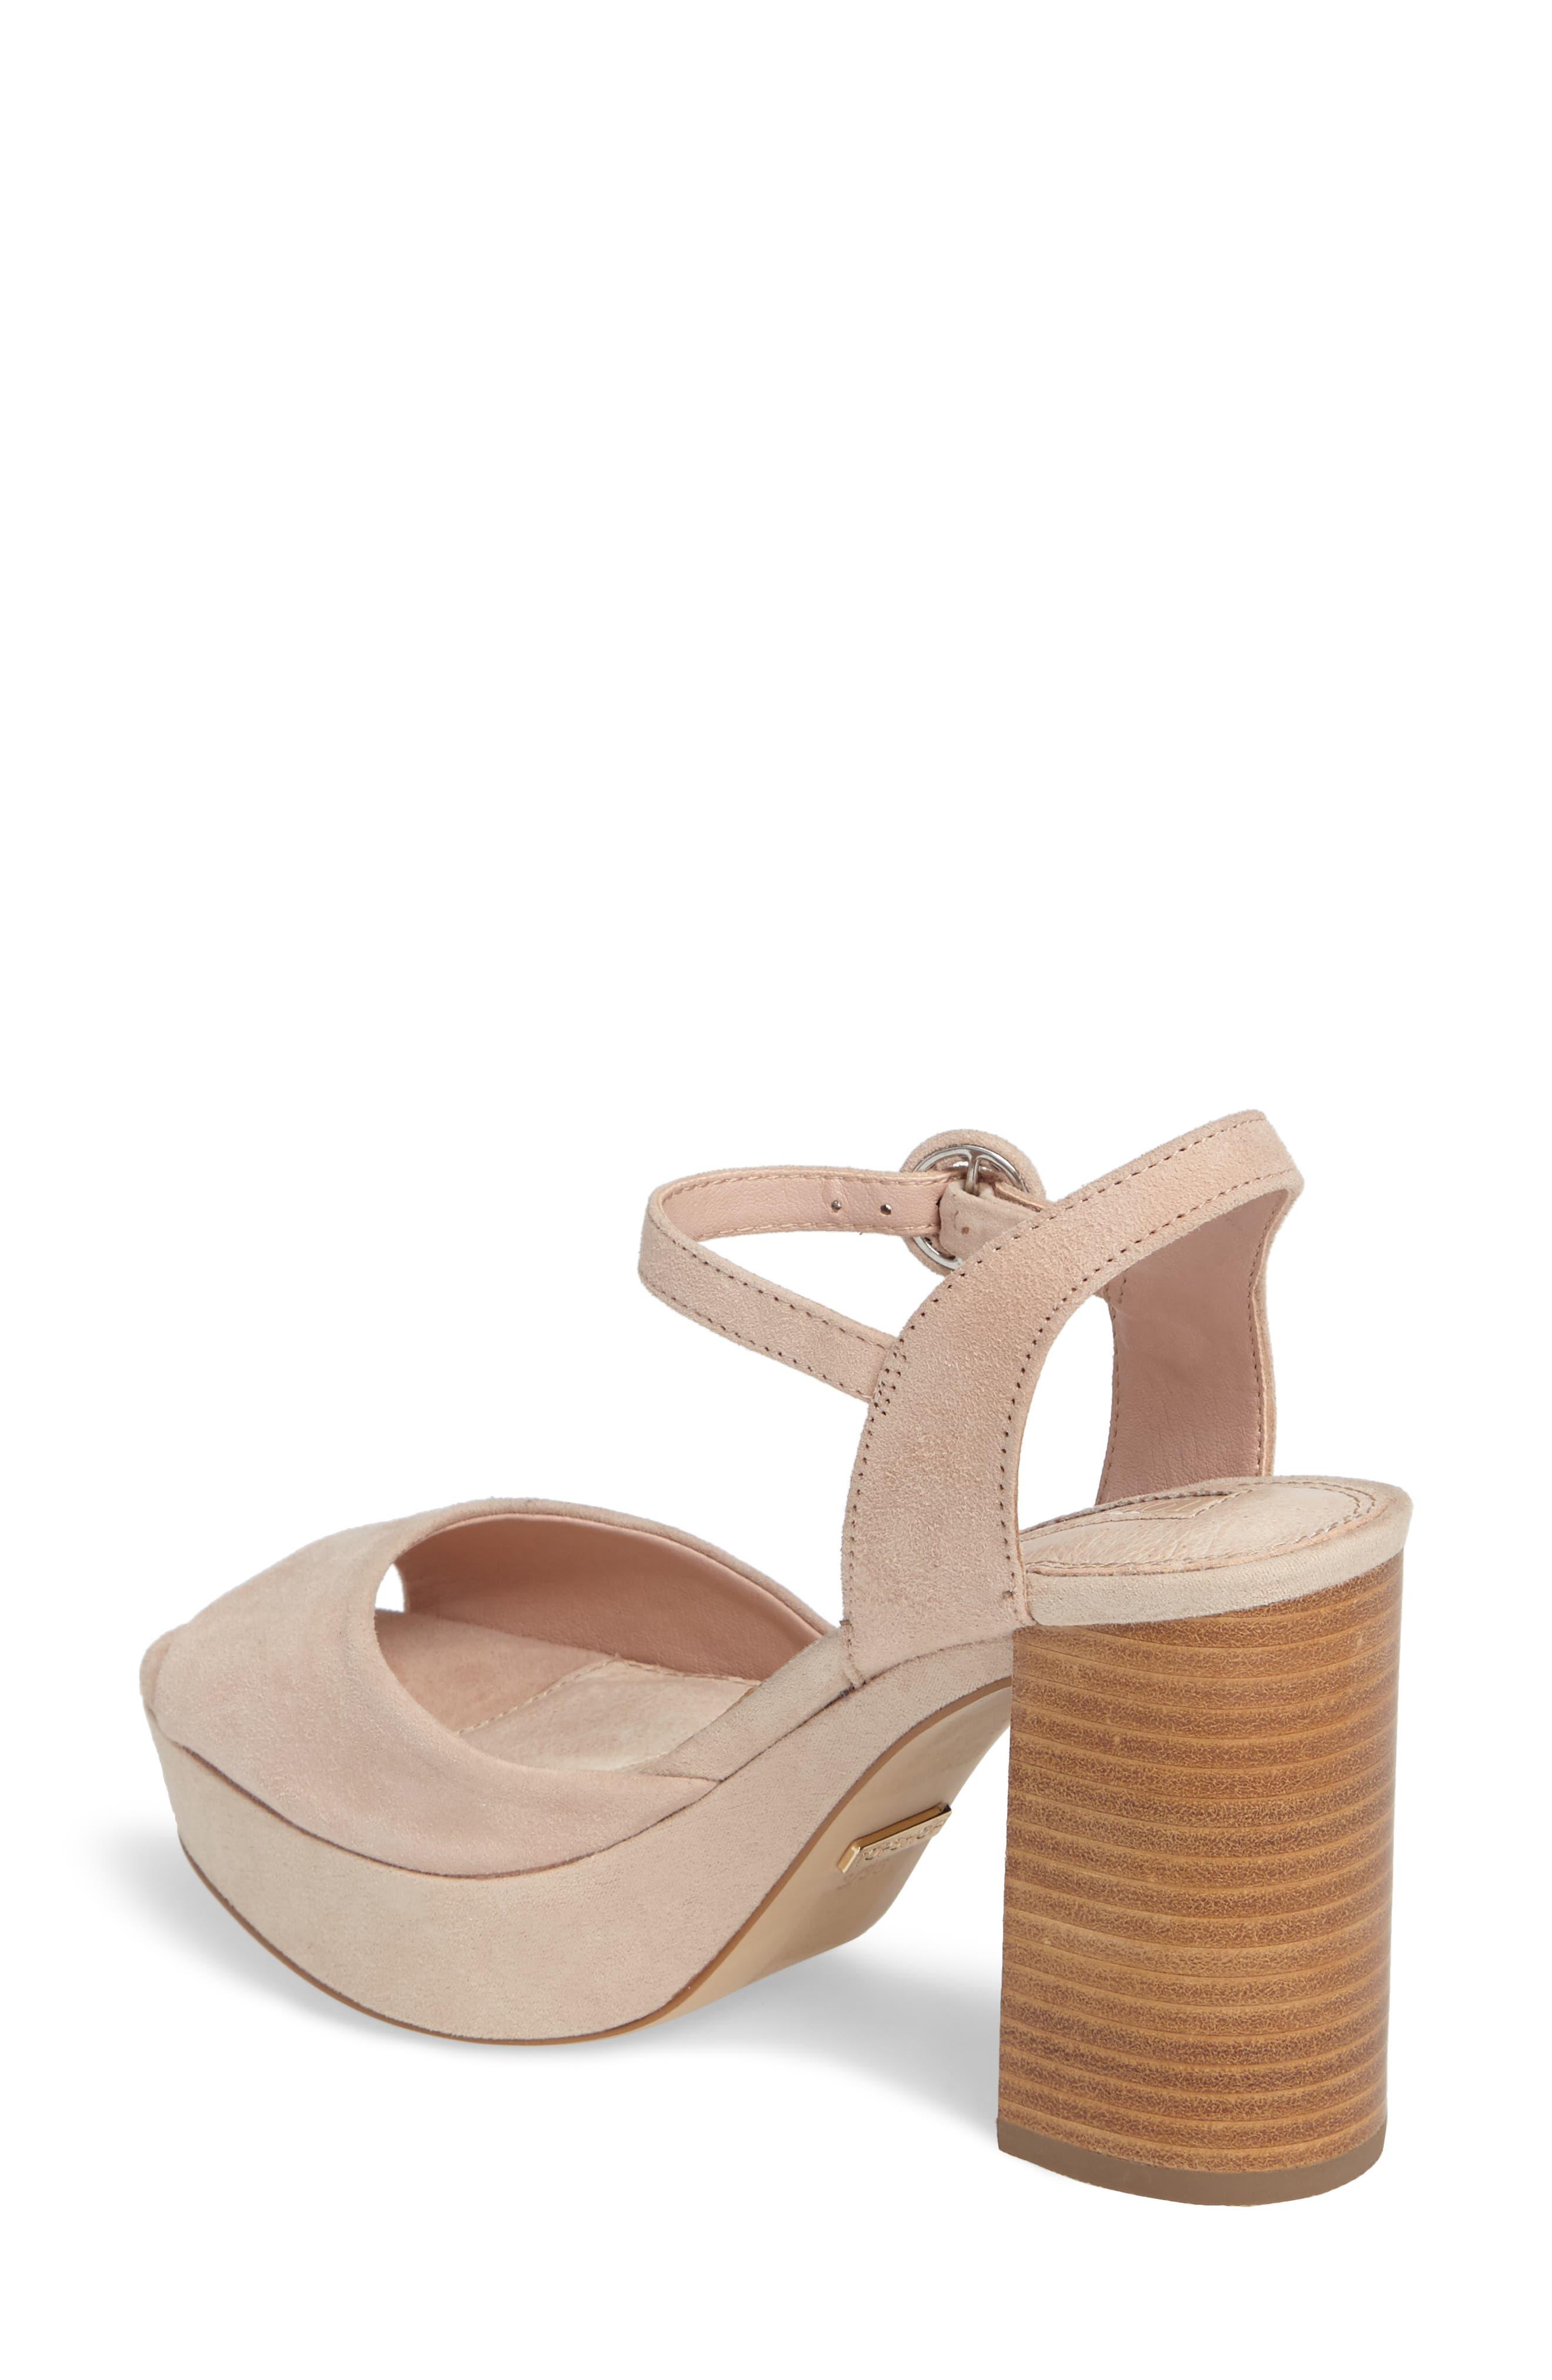 'Lana' Chunky Platform Sandal,                             Alternate thumbnail 2, color,                             250